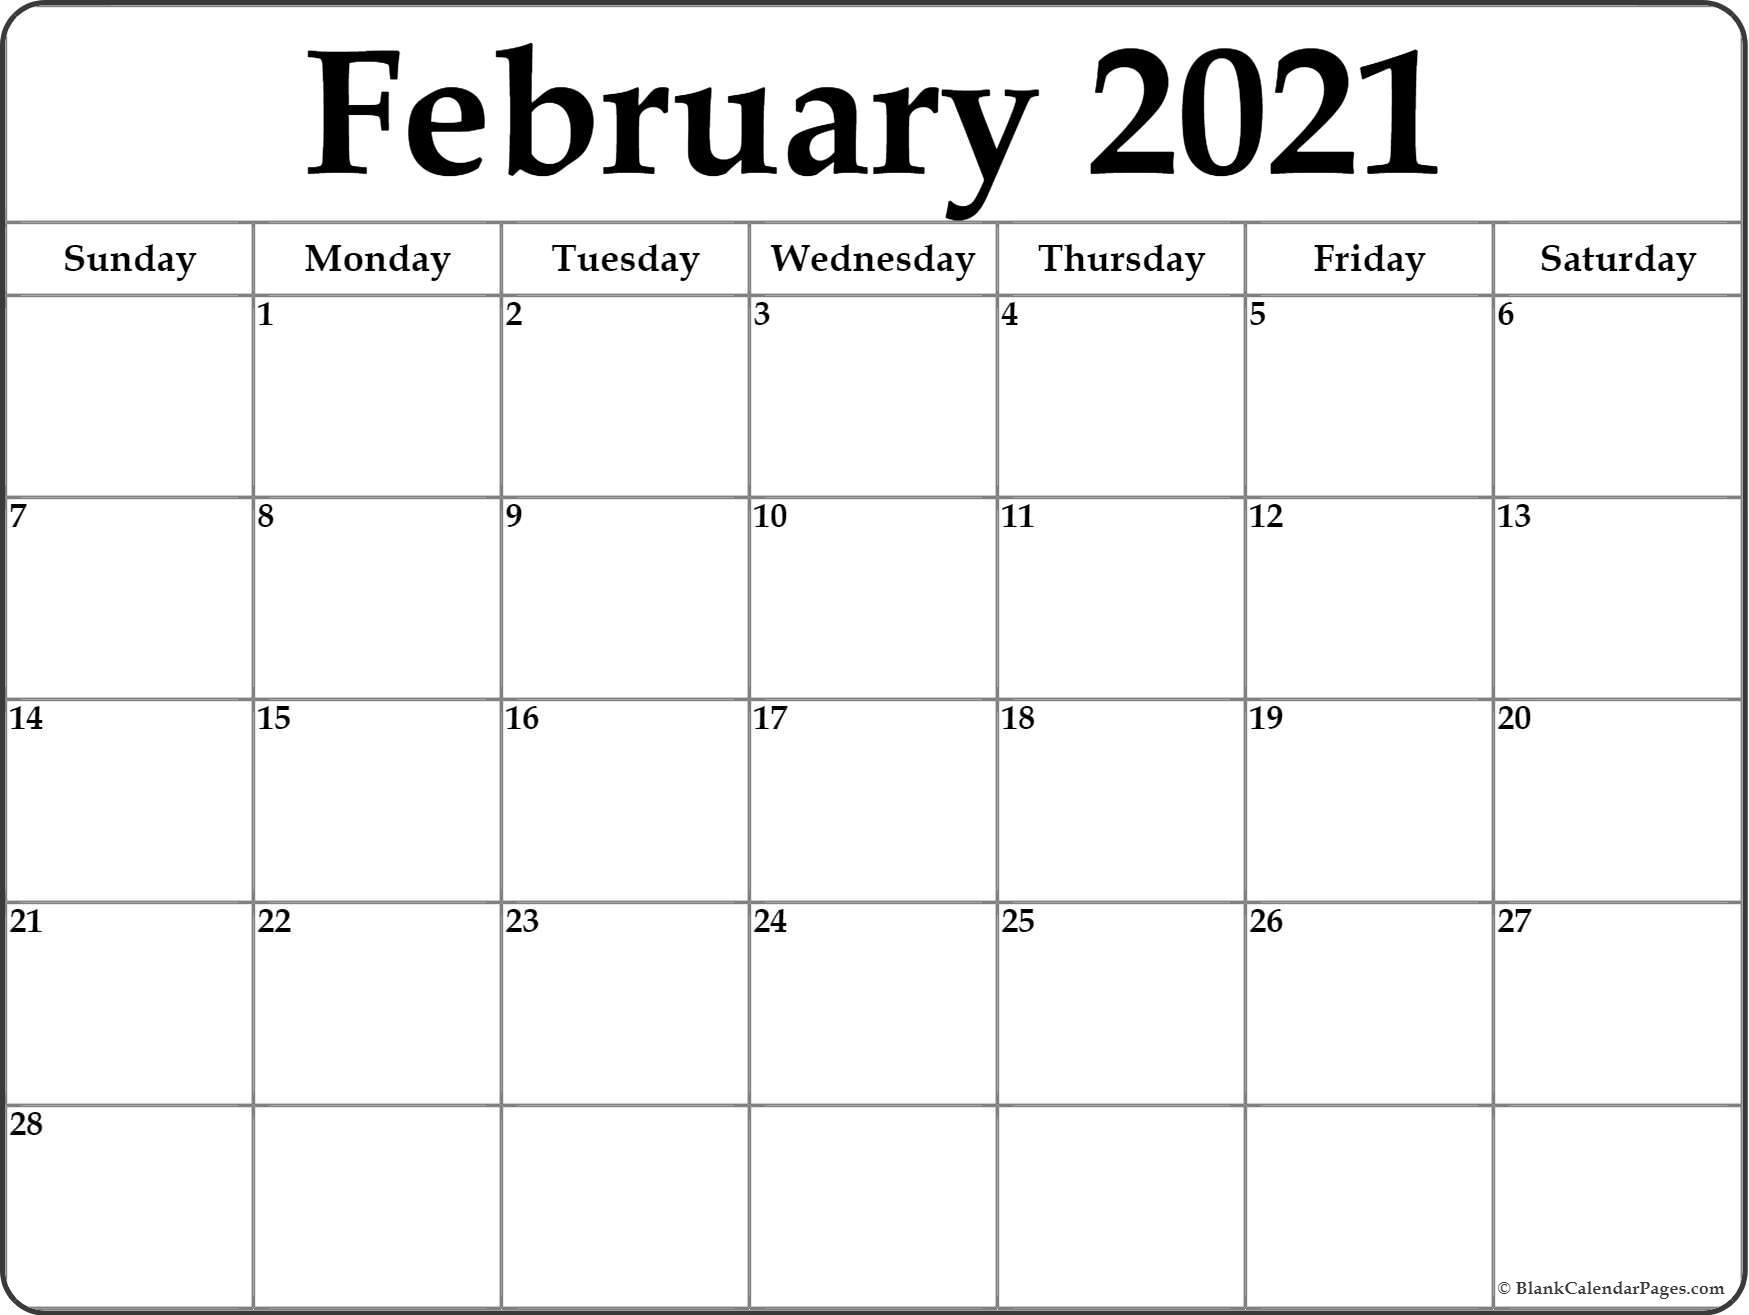 February 2021 Calendar | Free Printable Monthly Calendars